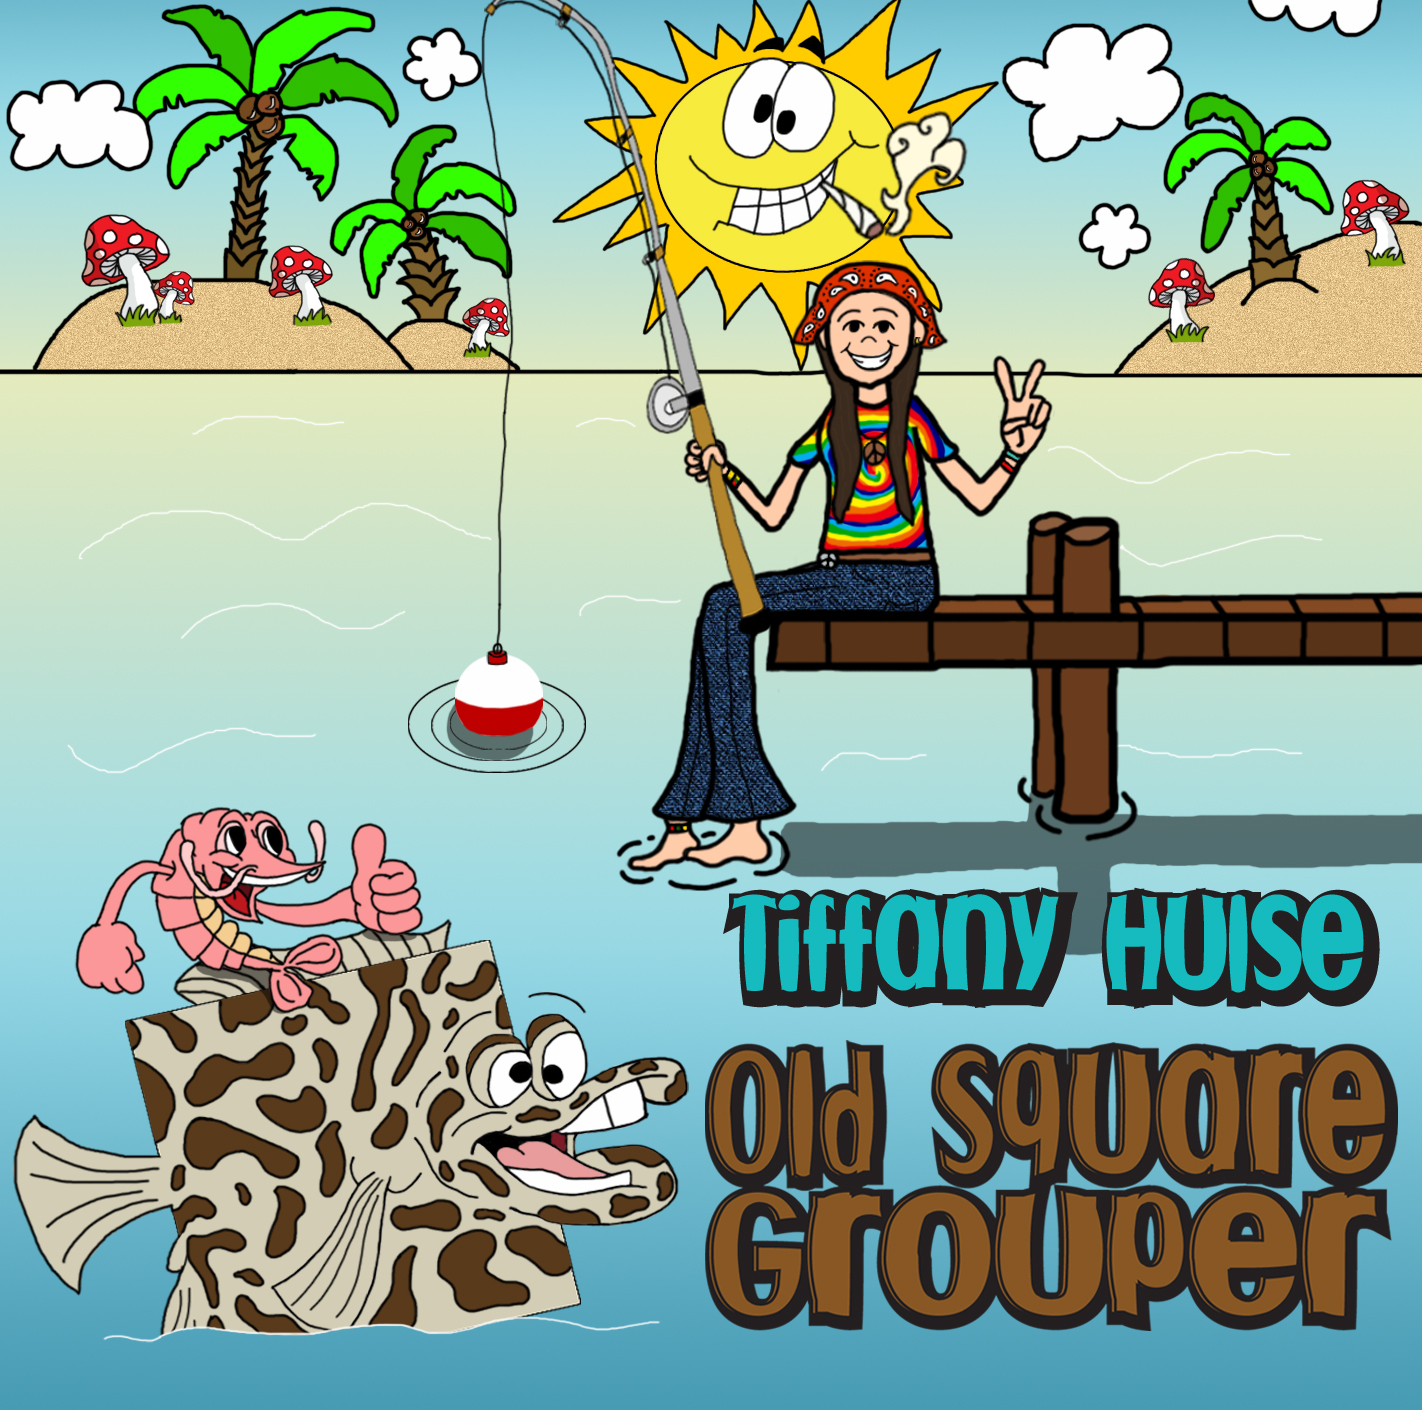 Old Square Grouper